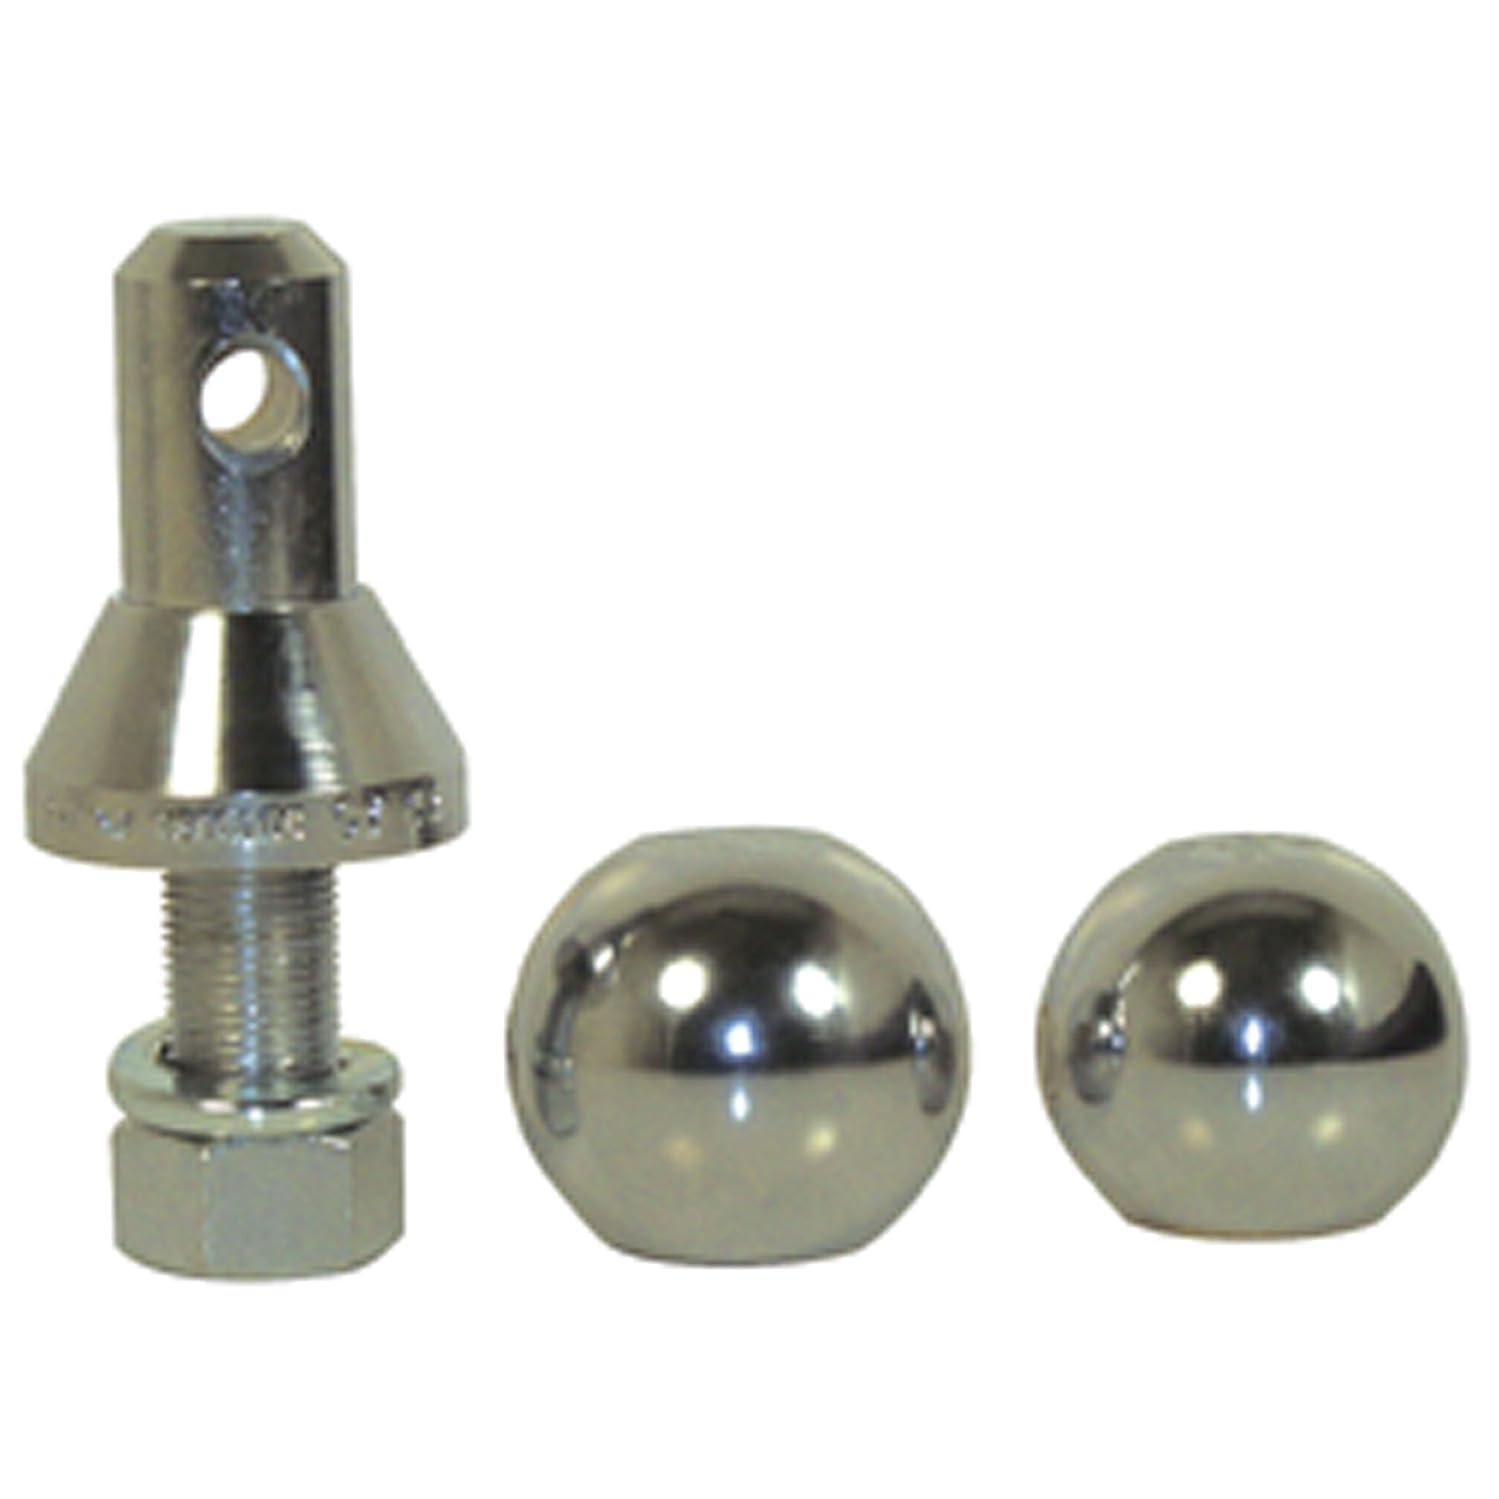 Convert-A-Ball 800B Nickel-Plated Shank with 2 Balls - 3/4